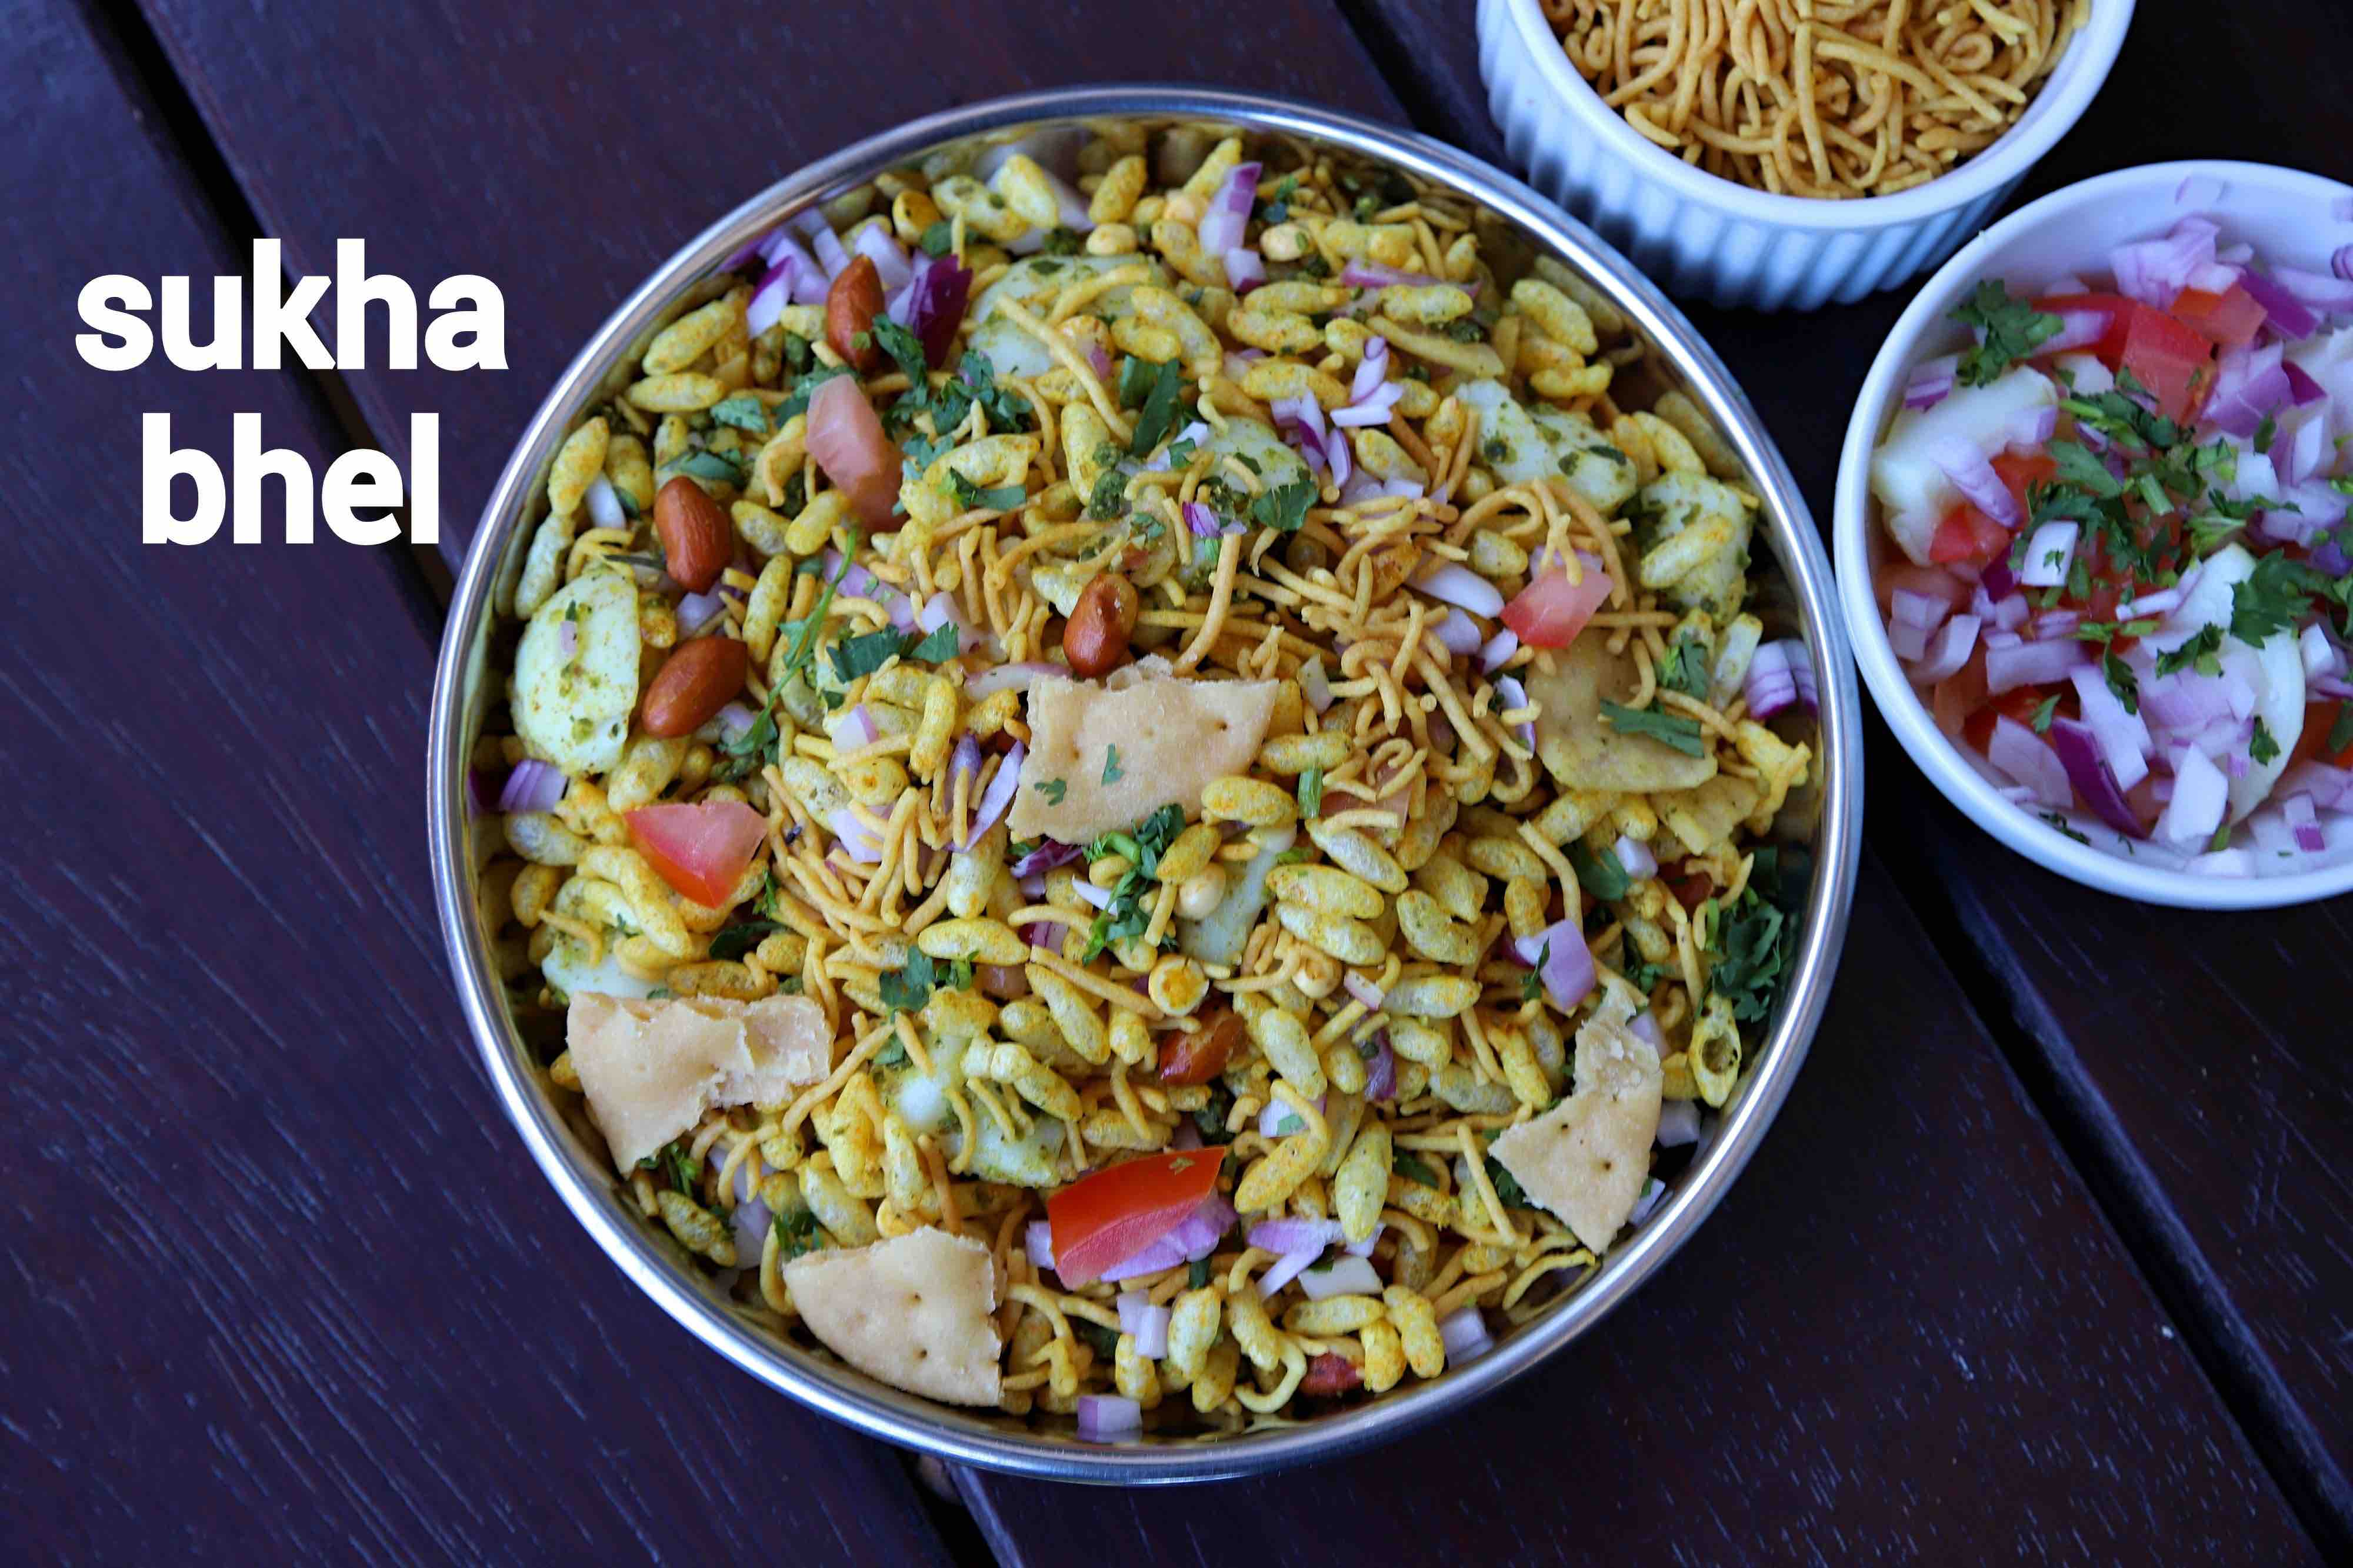 sukha bhel recipe | dry bhel puri recipe | sukka bhel puri